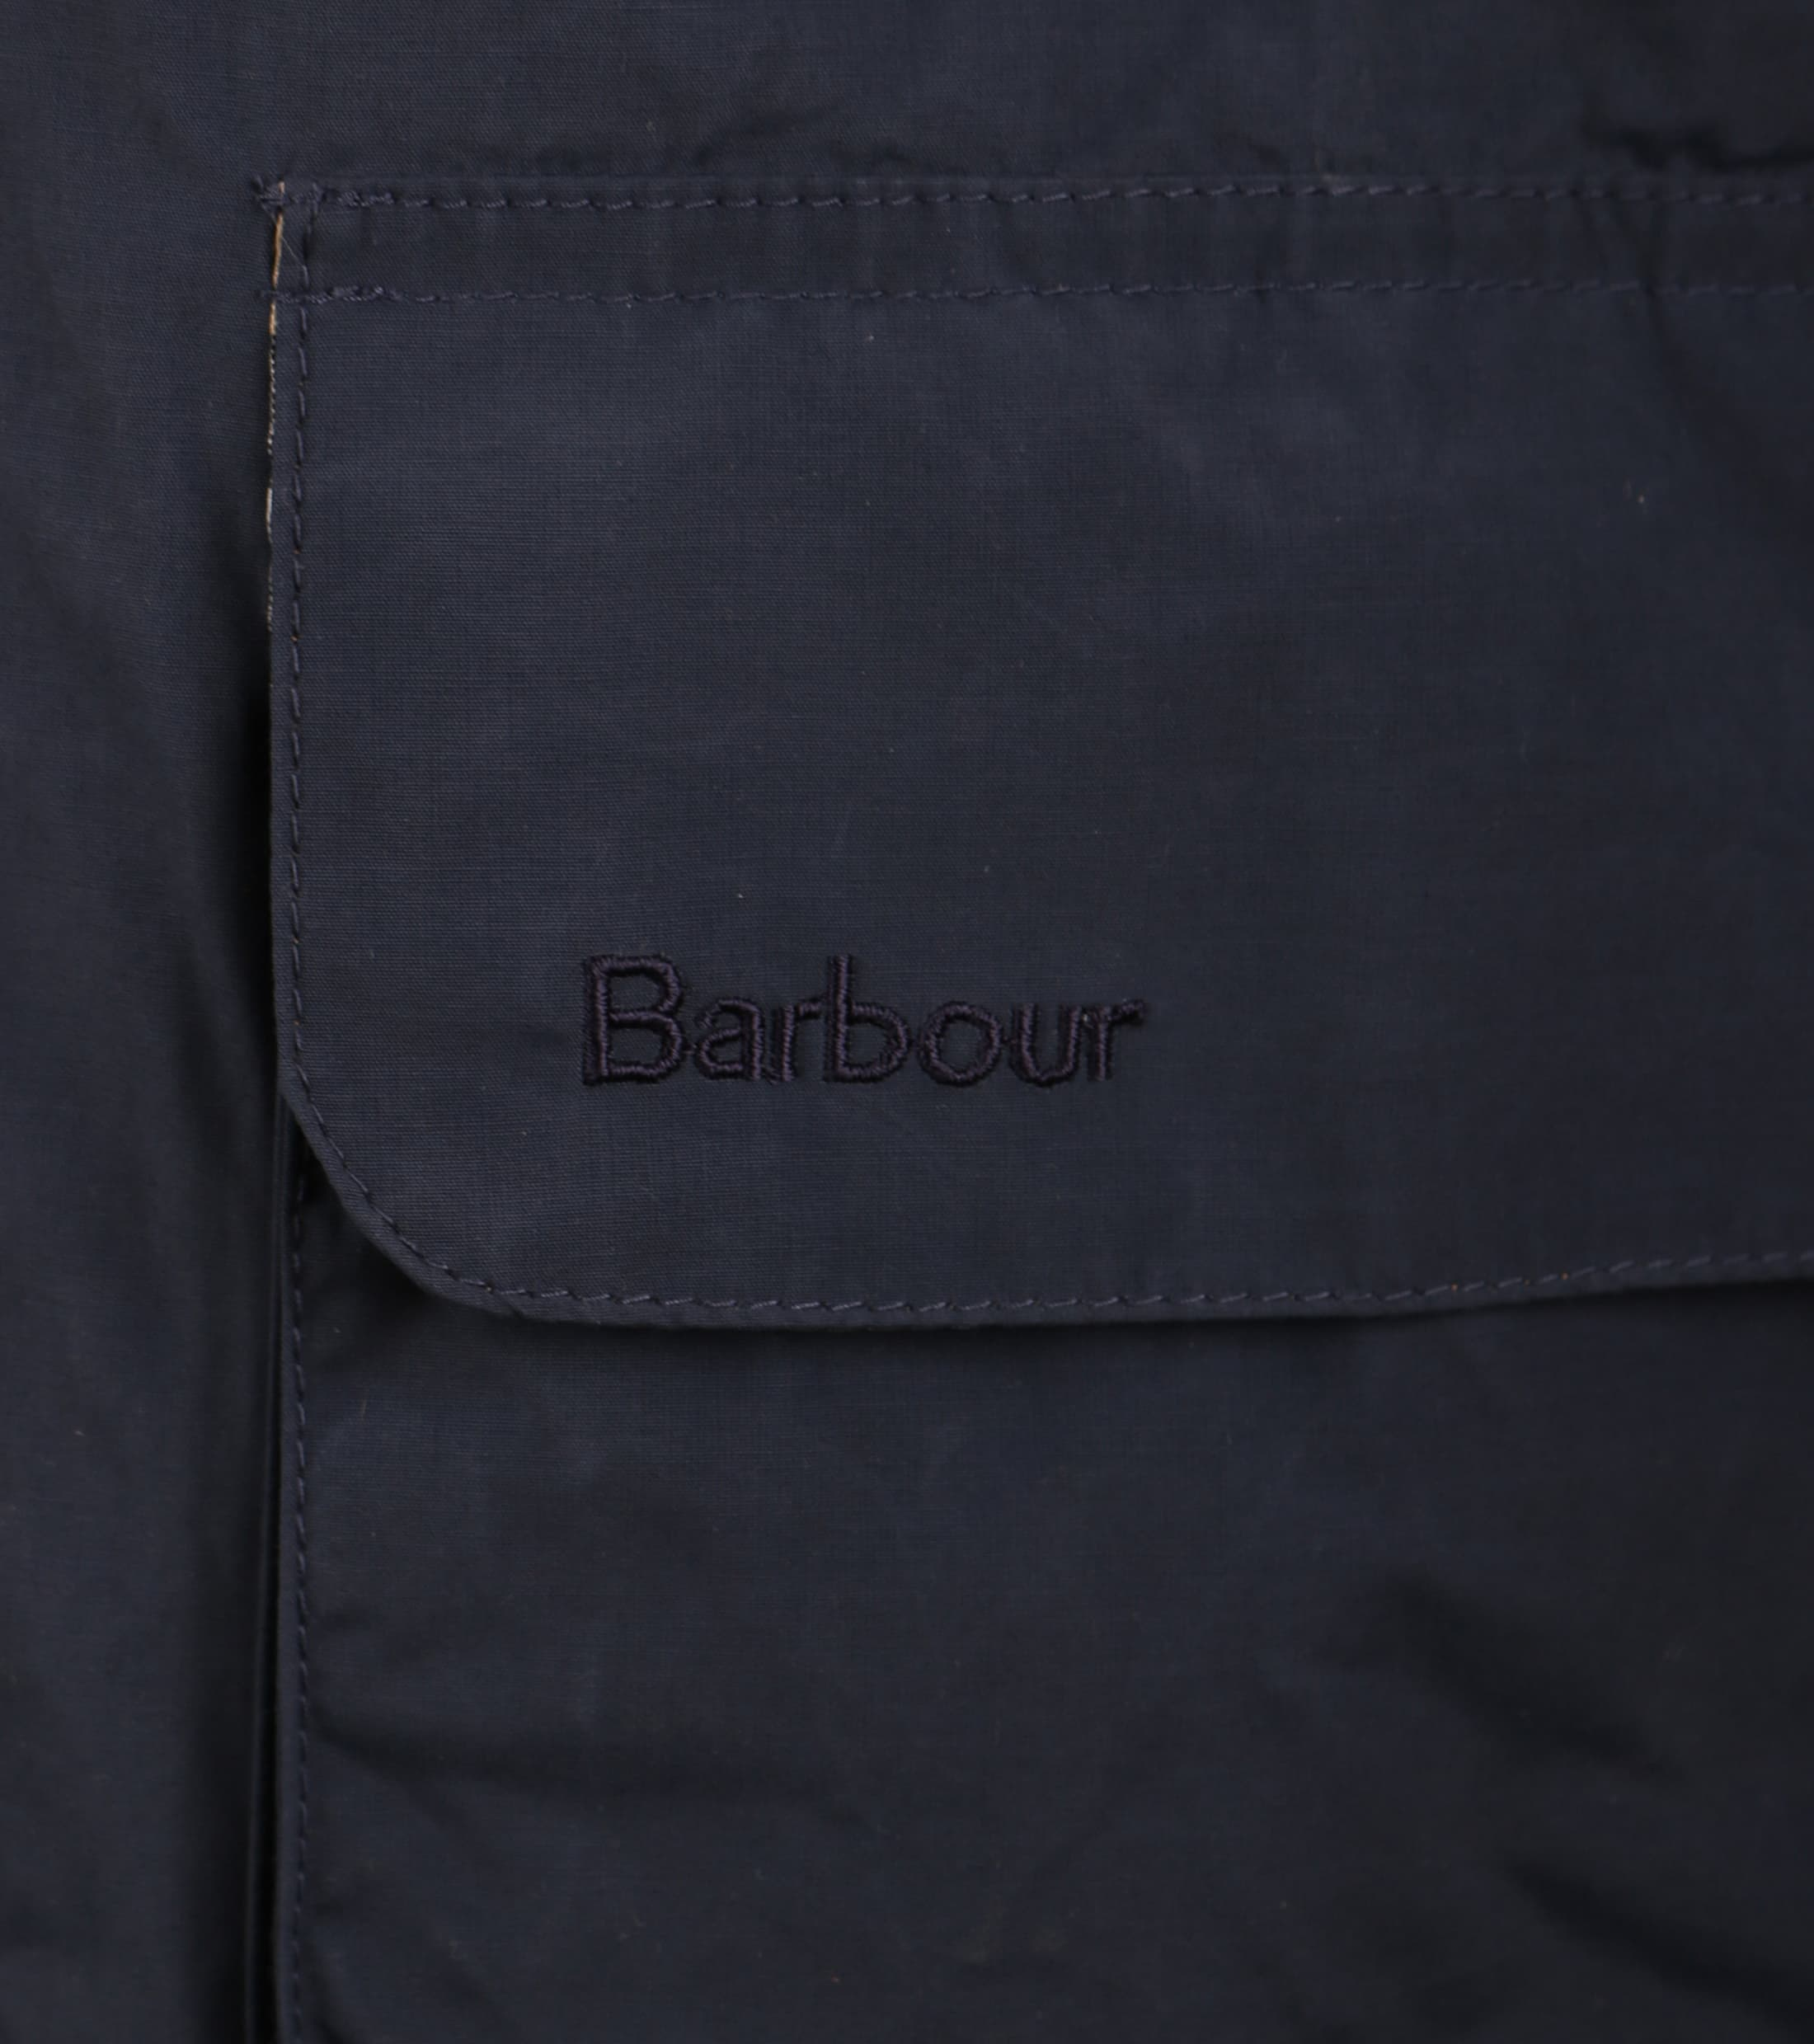 Barbour Port Zomerjas Donkerblauw foto 5